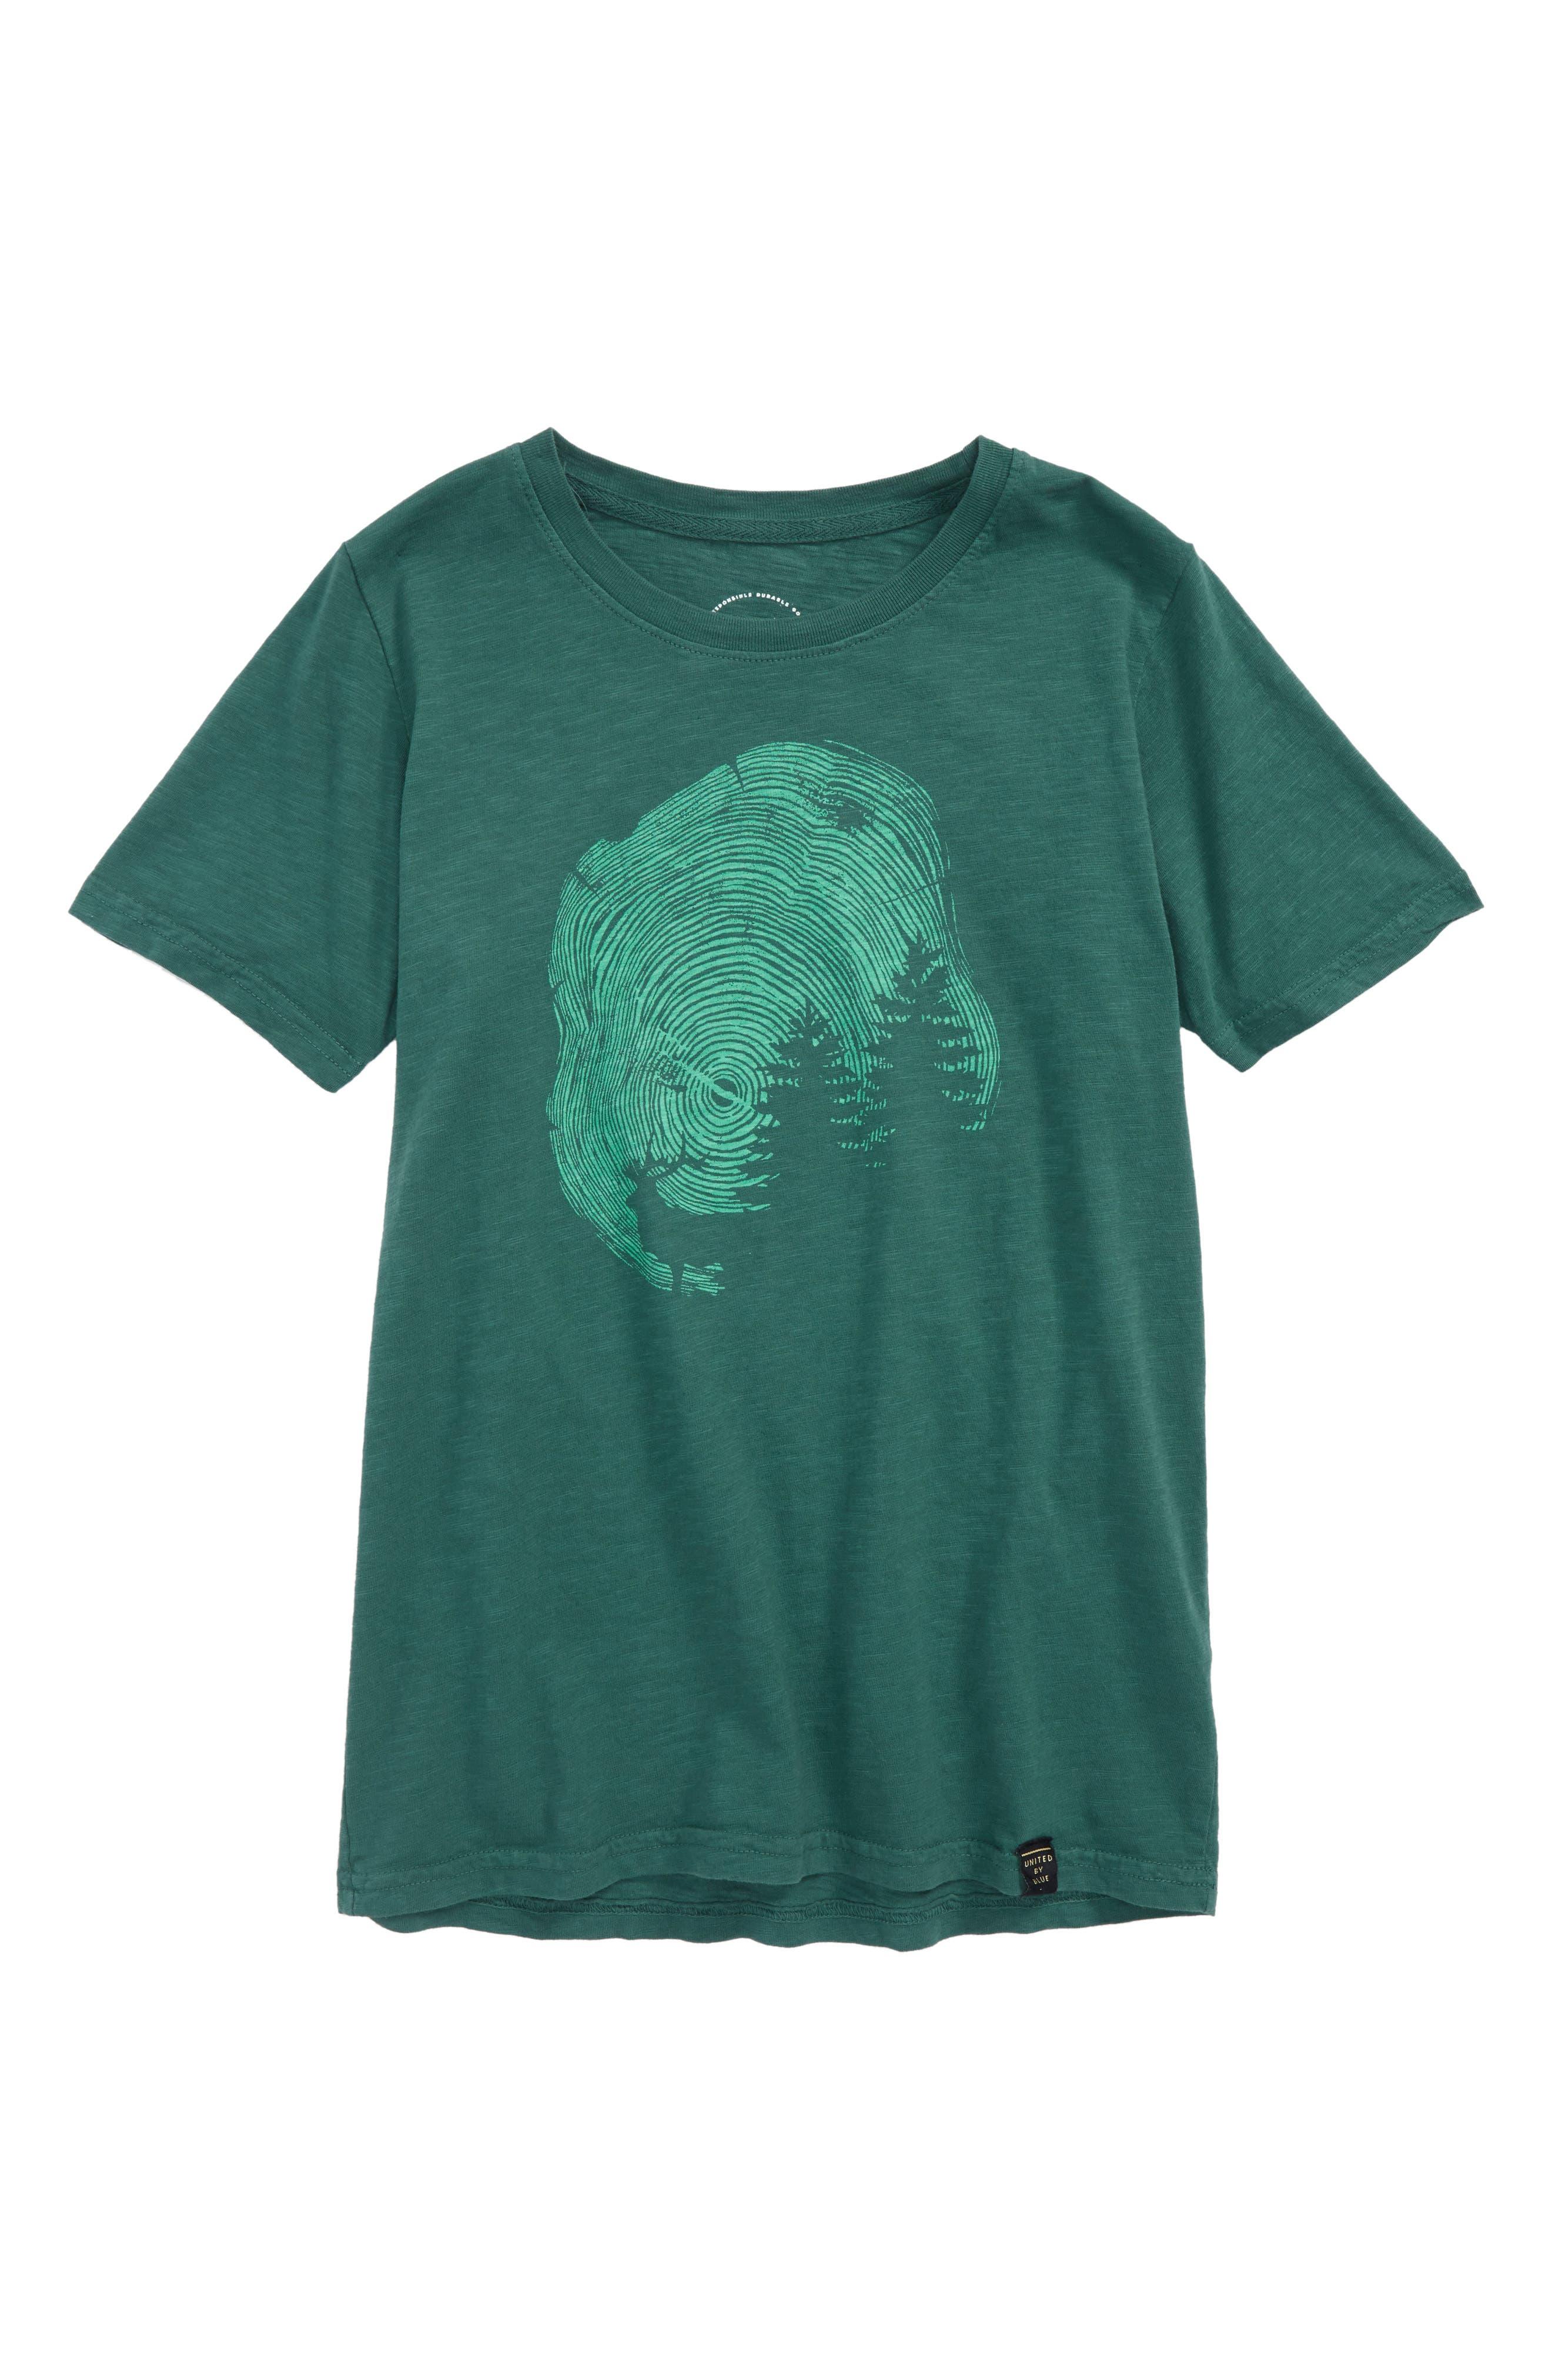 Gorham Organic Cotton T-Shirt,                         Main,                         color, Teal